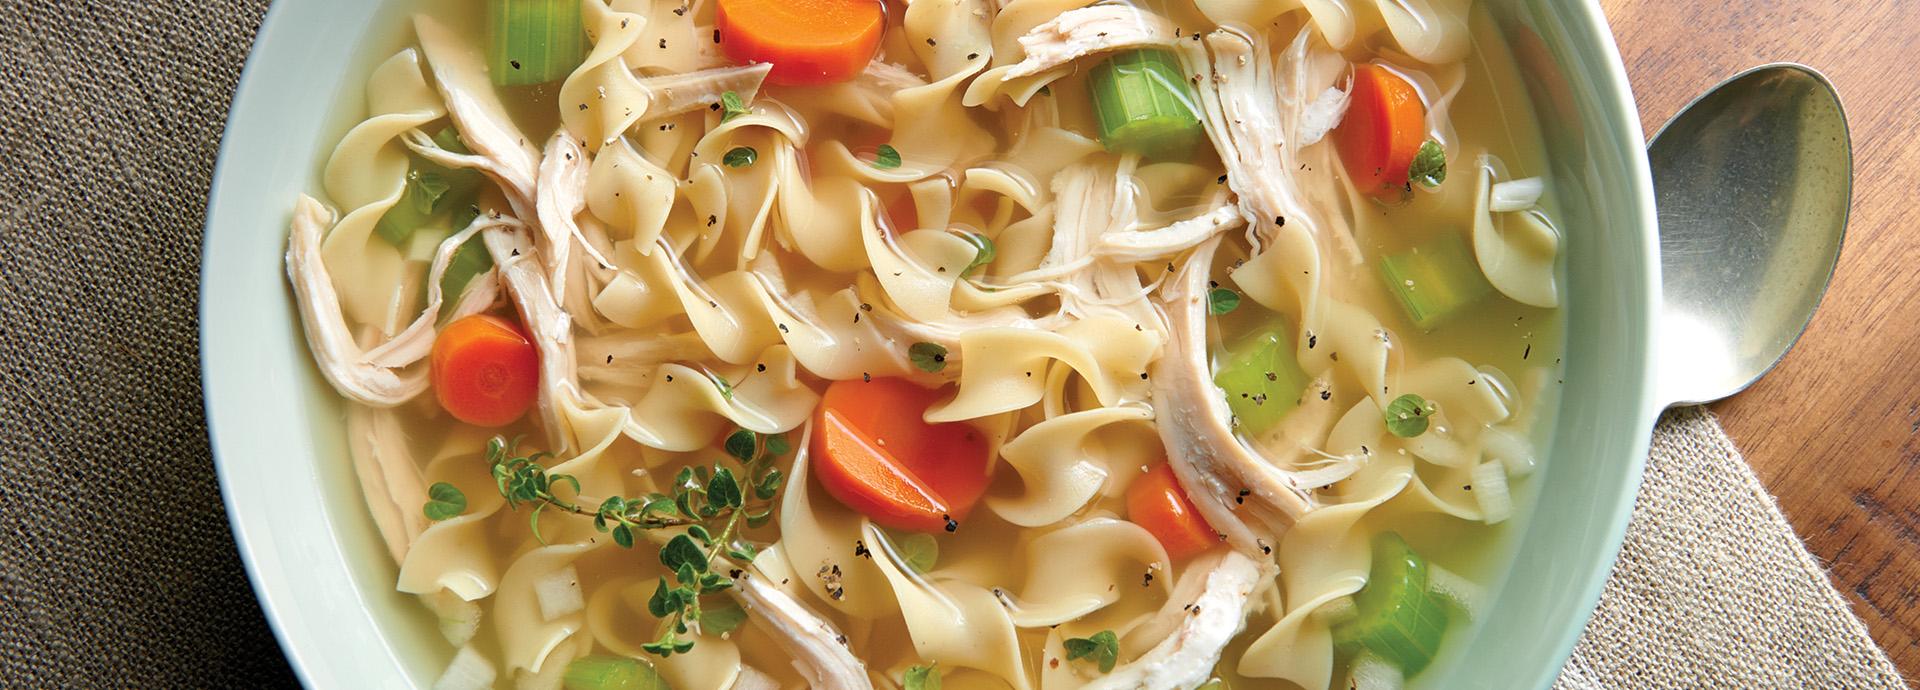 Skinner 174 Chicken Noodle Soup